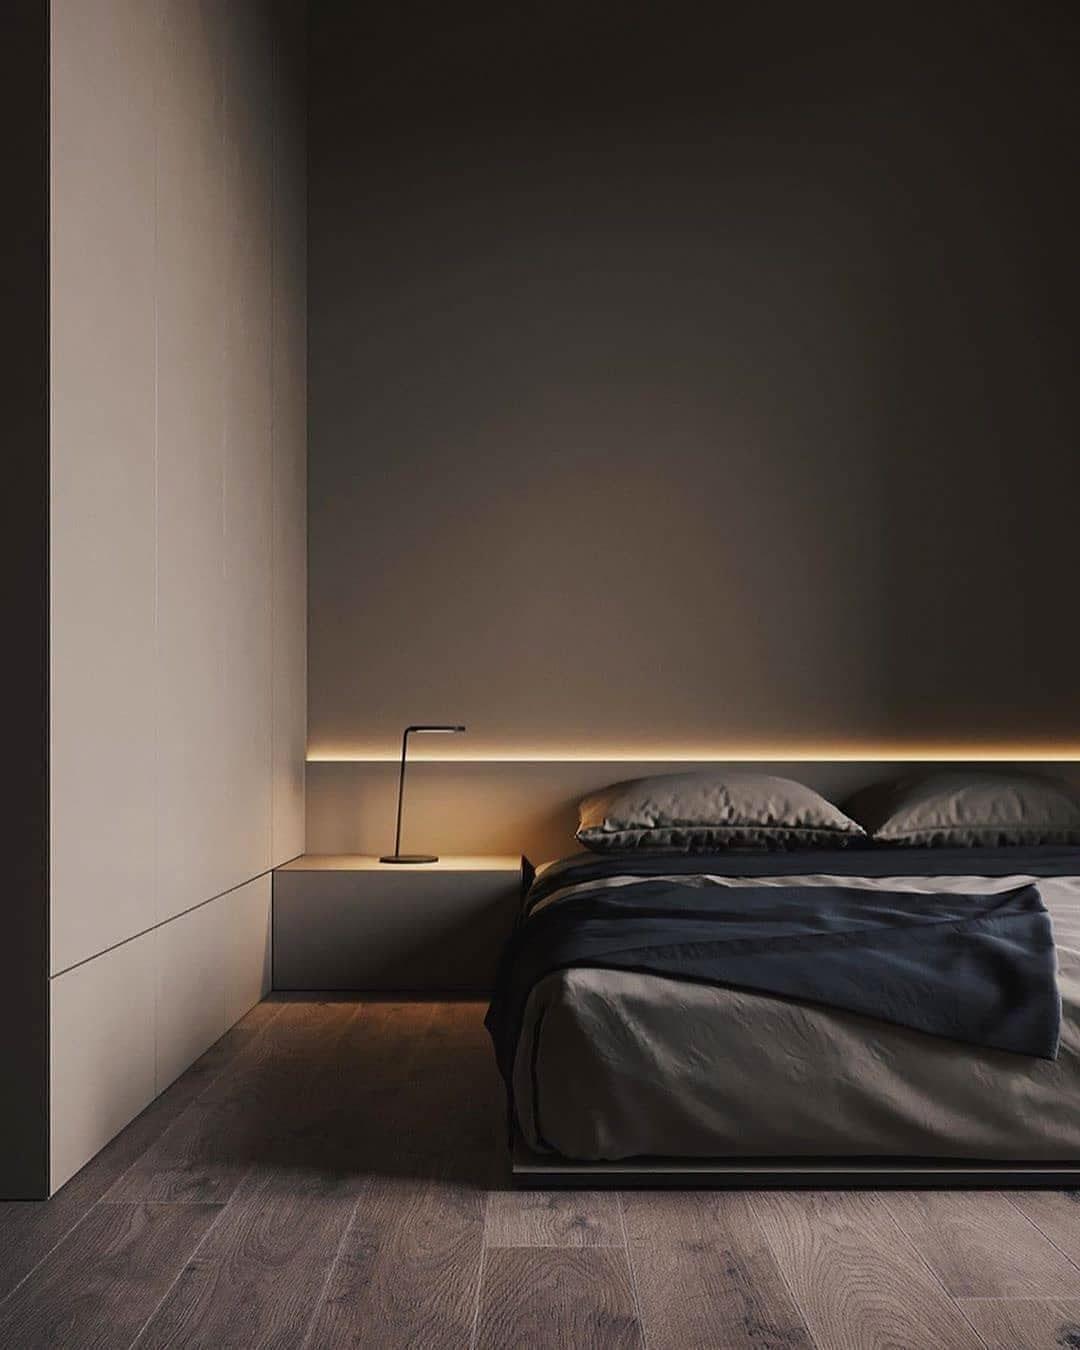 Retro Slaapkamer Ideeen.15x Moderne Slaapkamer Ideeen Slaapkamer Ideeen